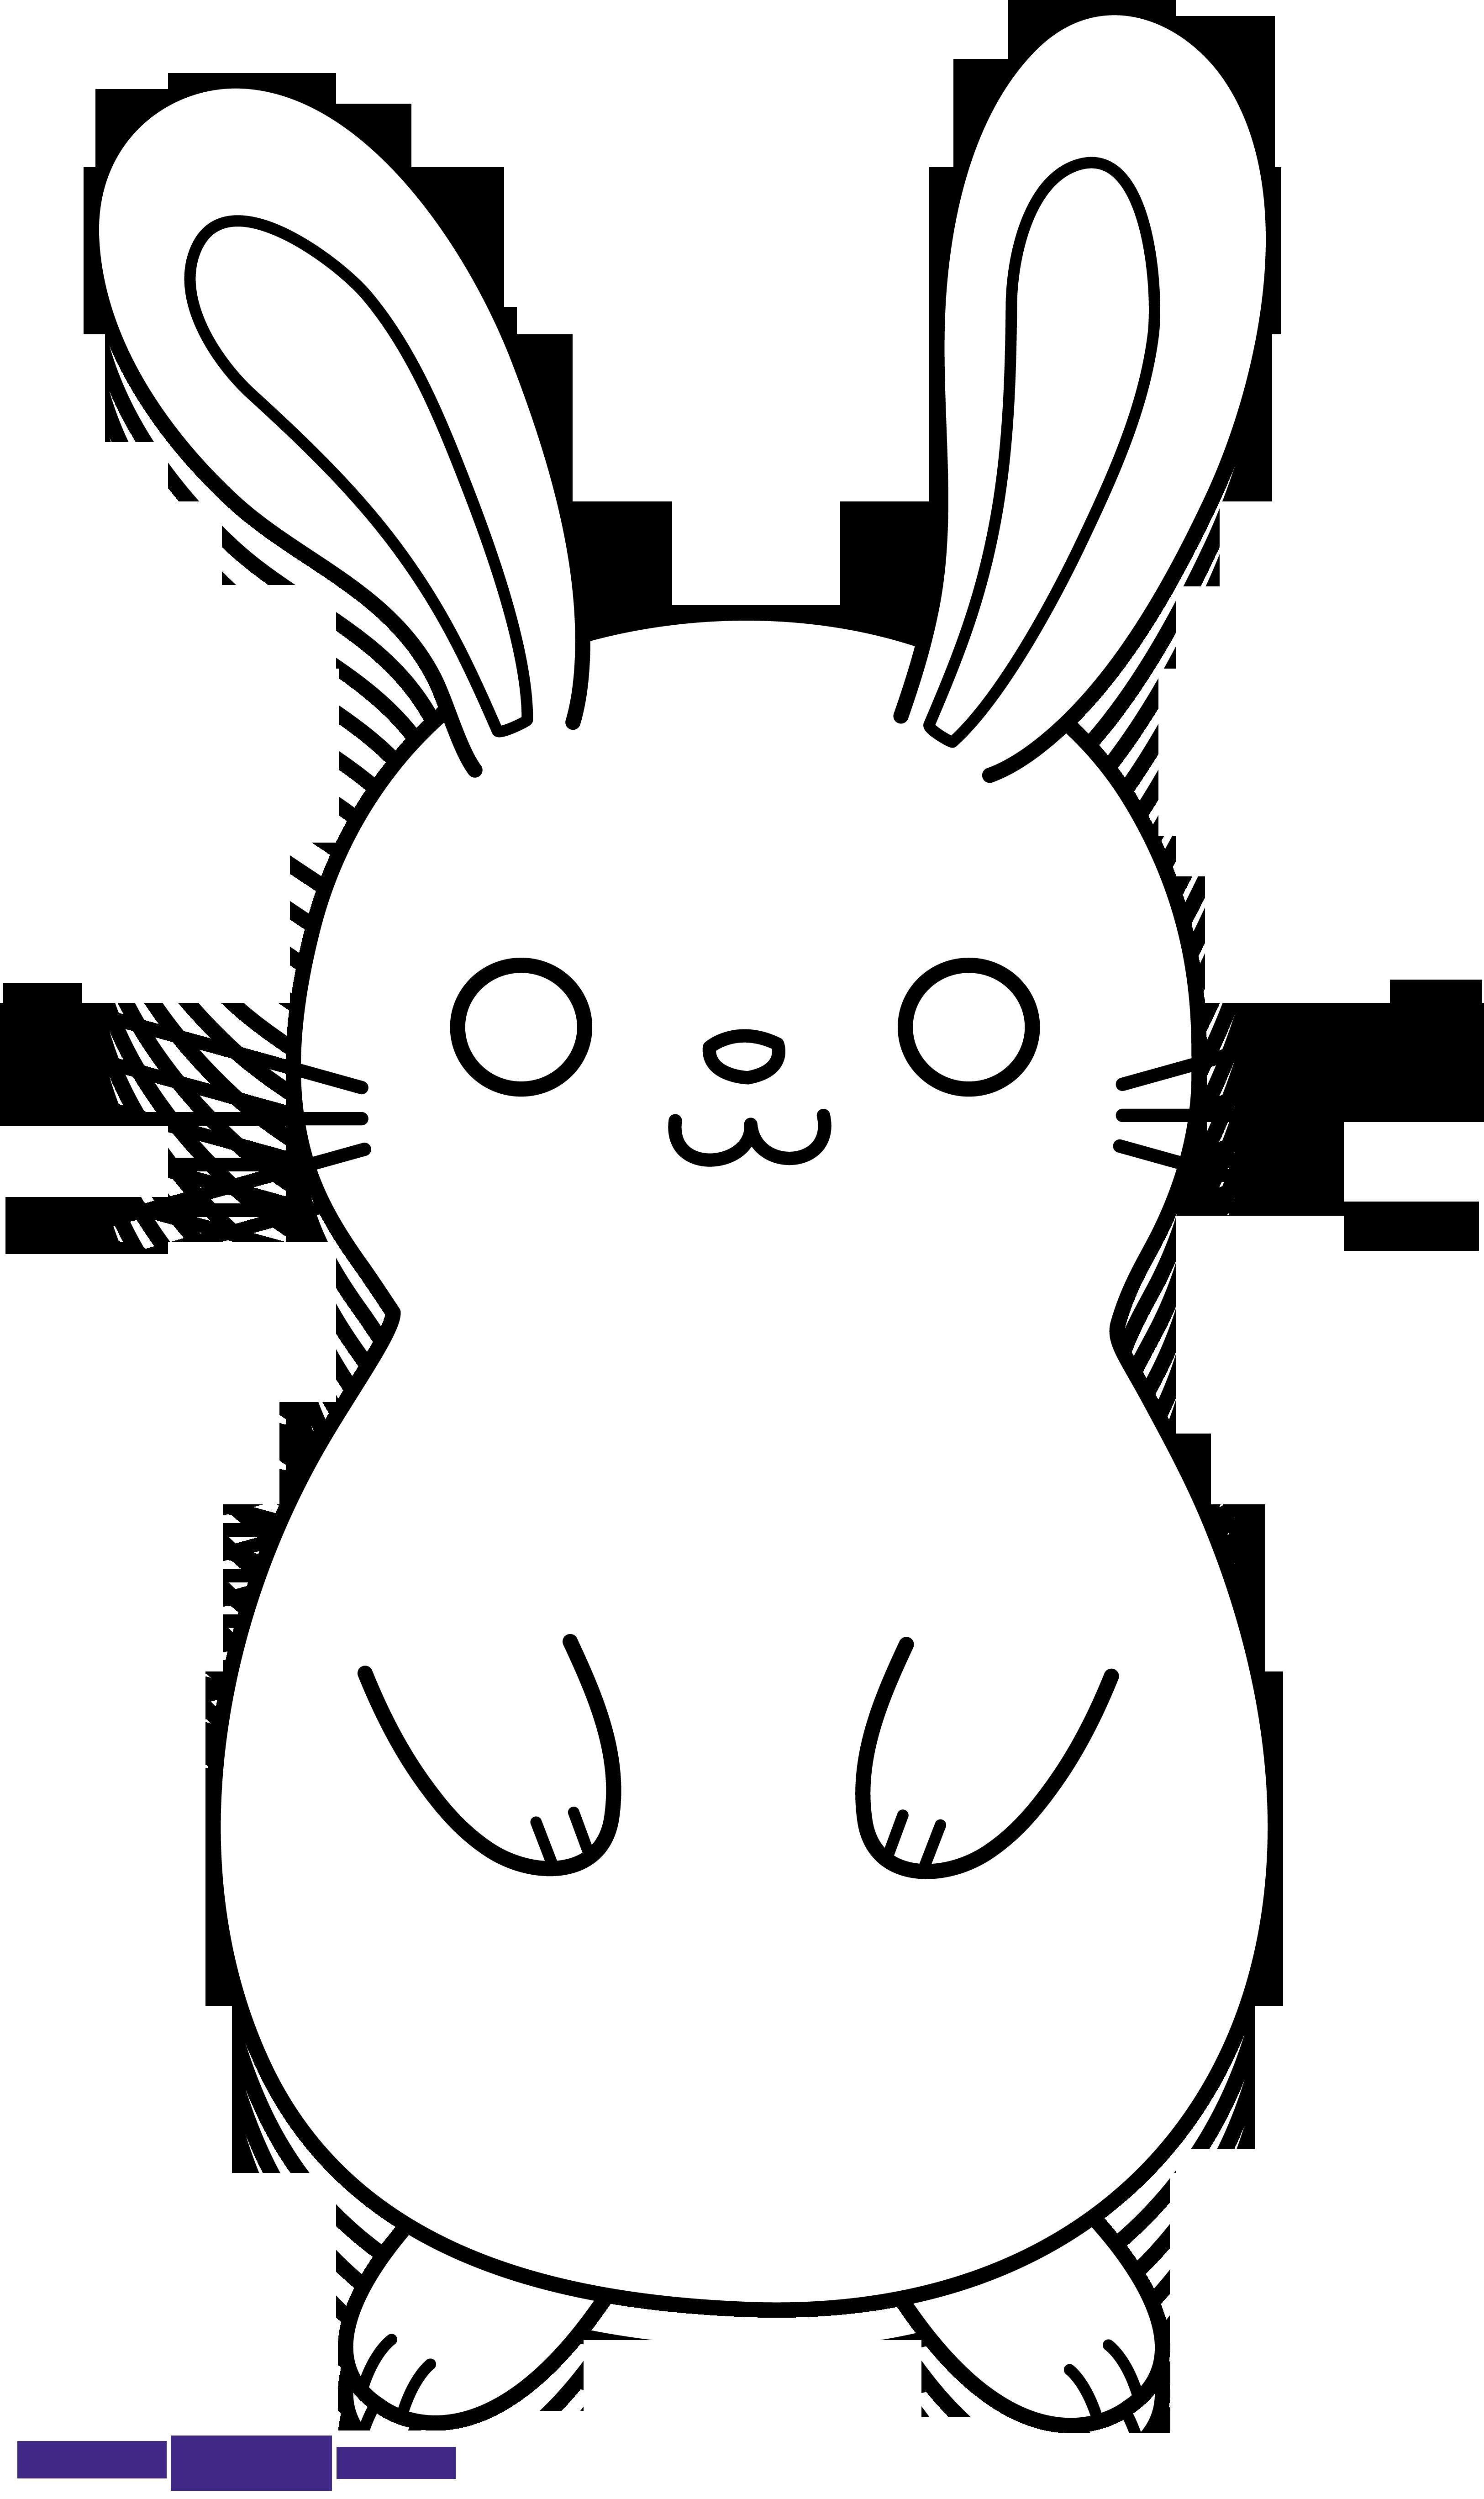 Bunny baseball clipart jpg royalty free download Bunny Rabbit Cute Lineart Black White Clipart - Sweet Clip Art jpg royalty free download